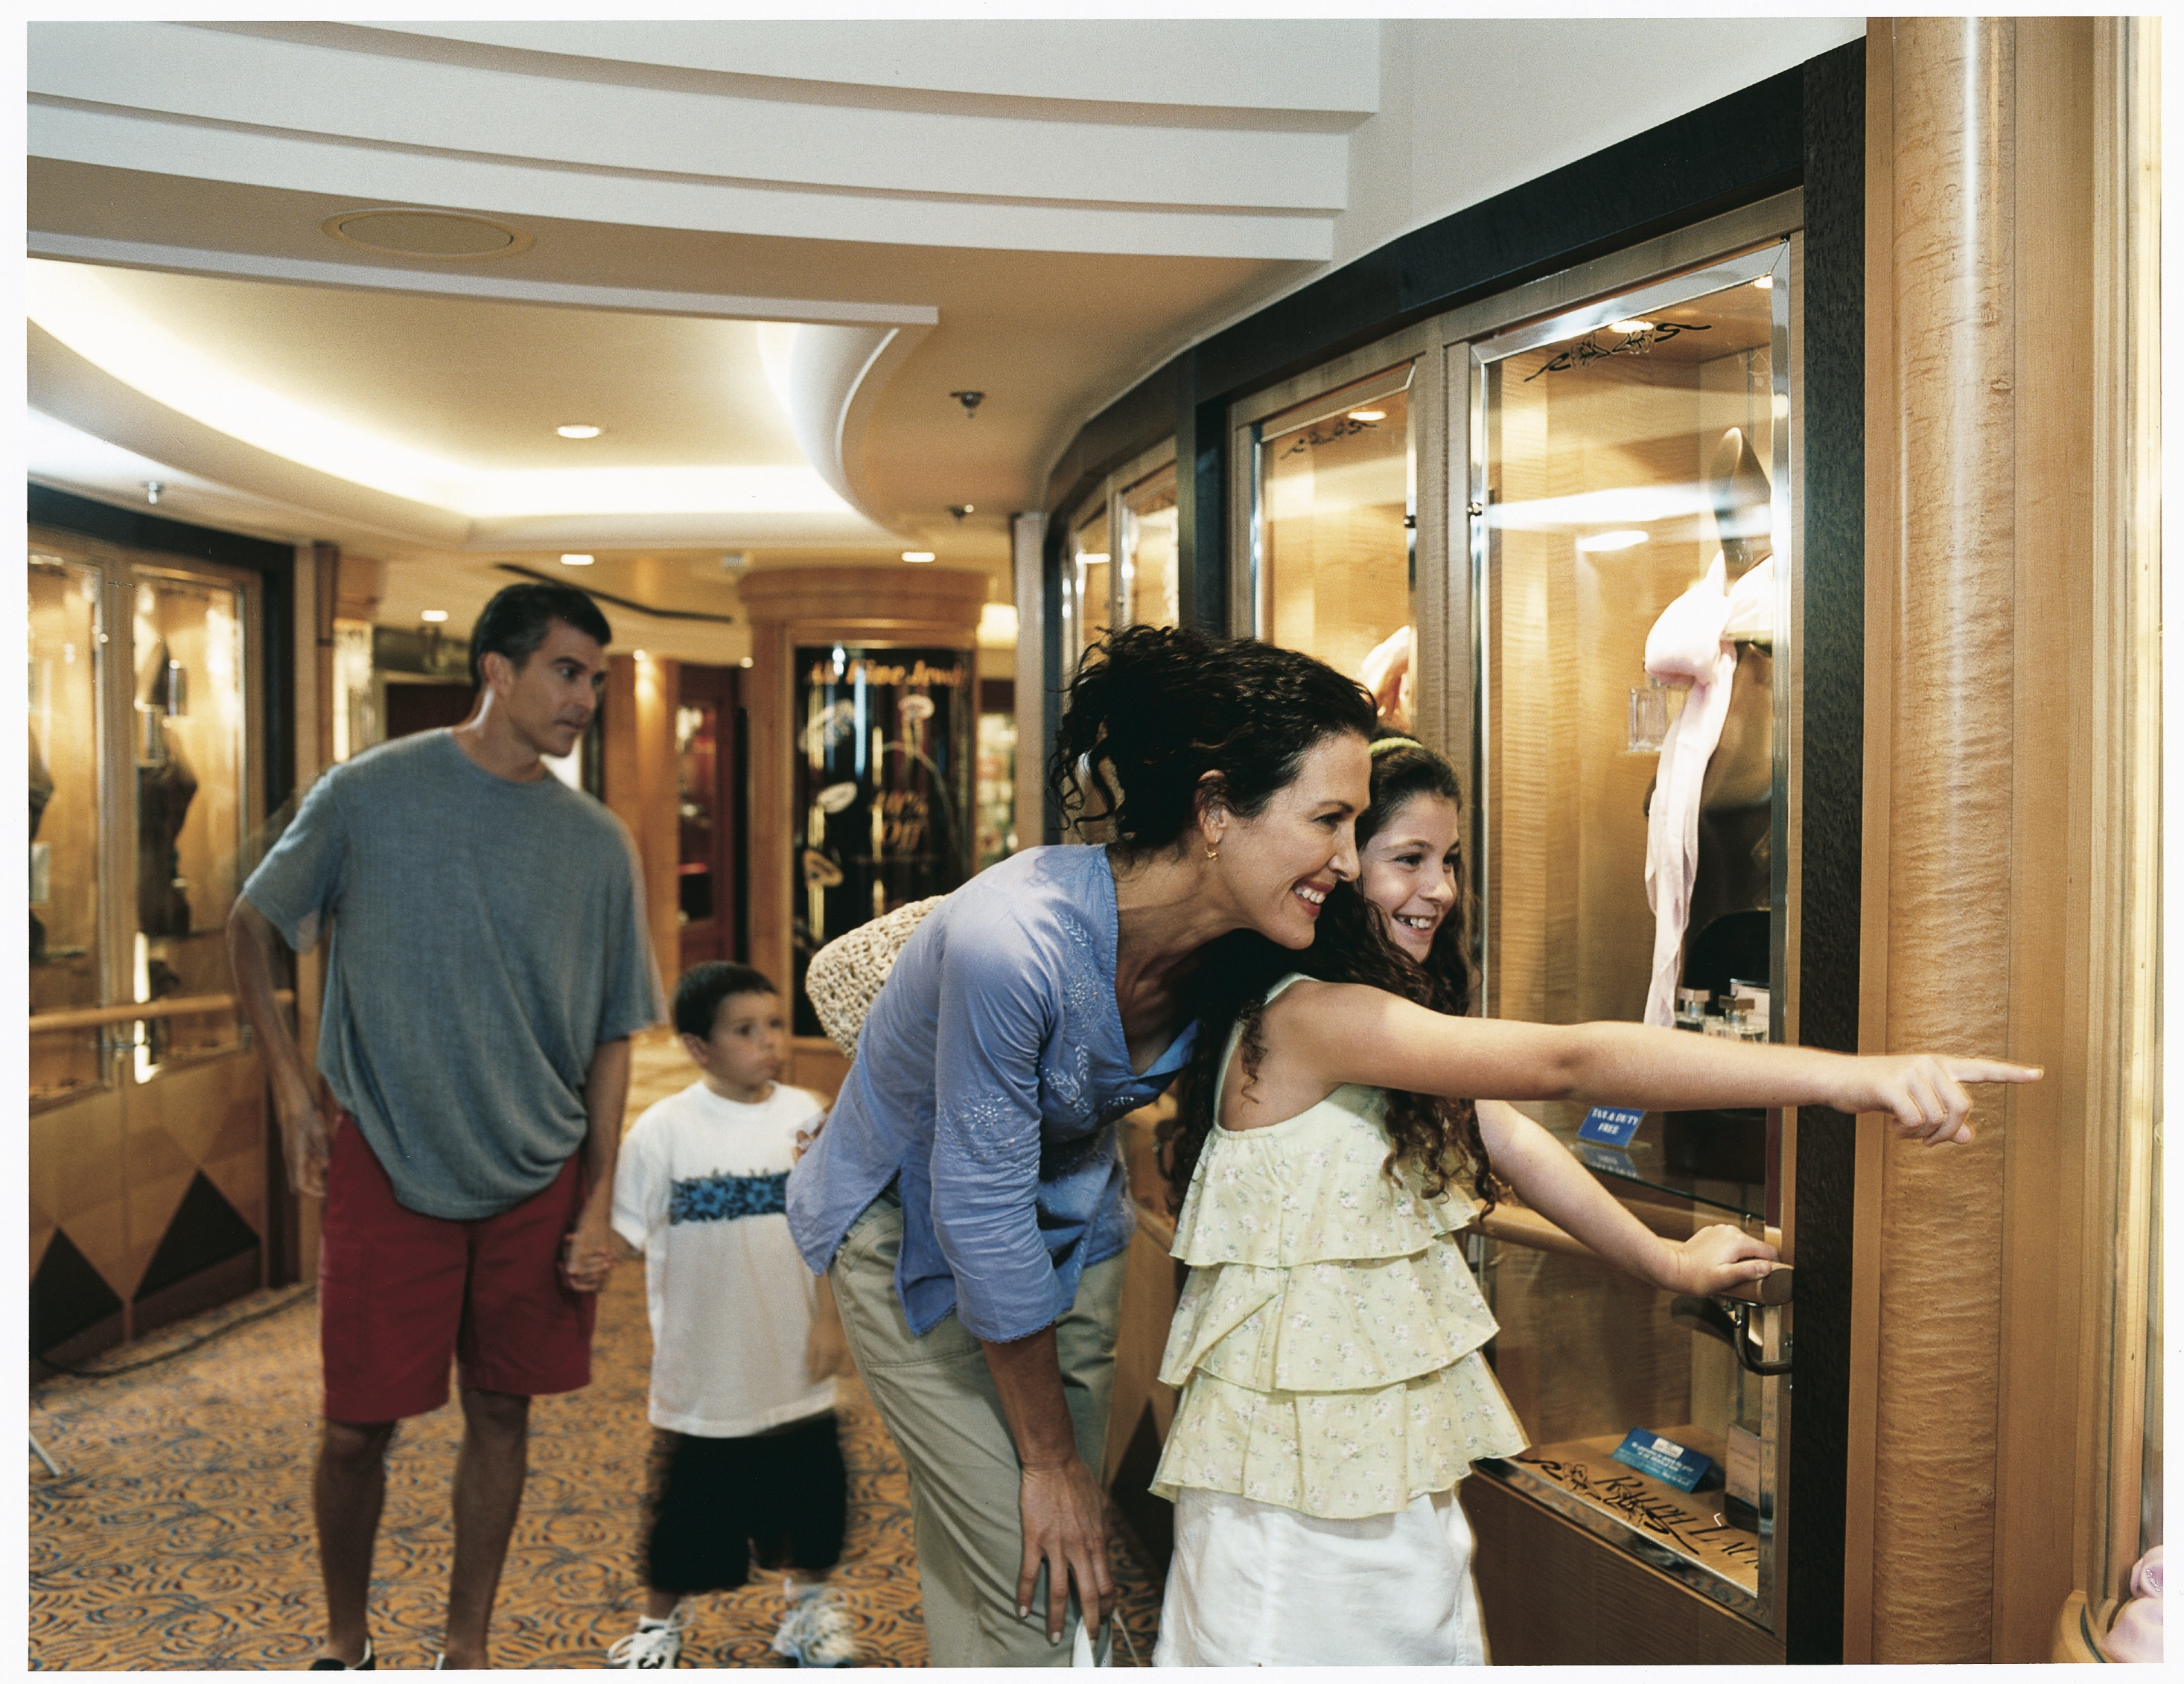 Royal Caribbean International Jewel of the Seas Interior Window Shopping.jpeg